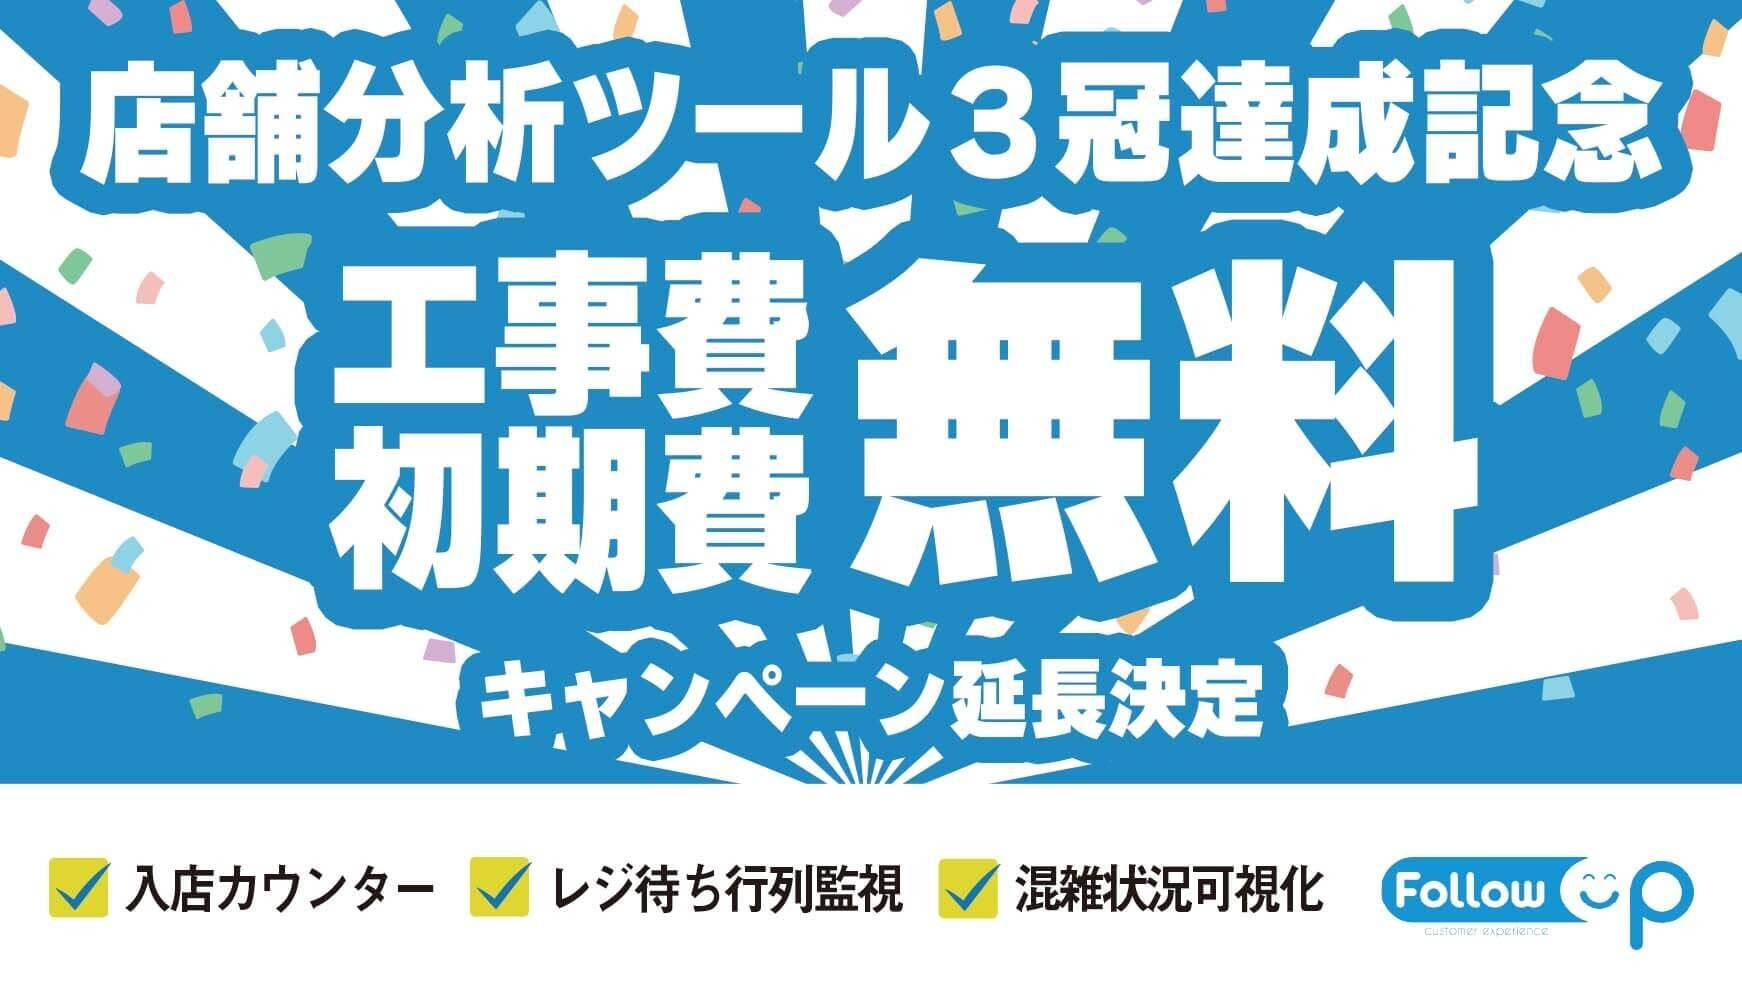 「FollowUP(店舗DXツール)」3冠達成記念 工事費&初期費用無料キャンペーン延長 〜2021年11月末まで〜